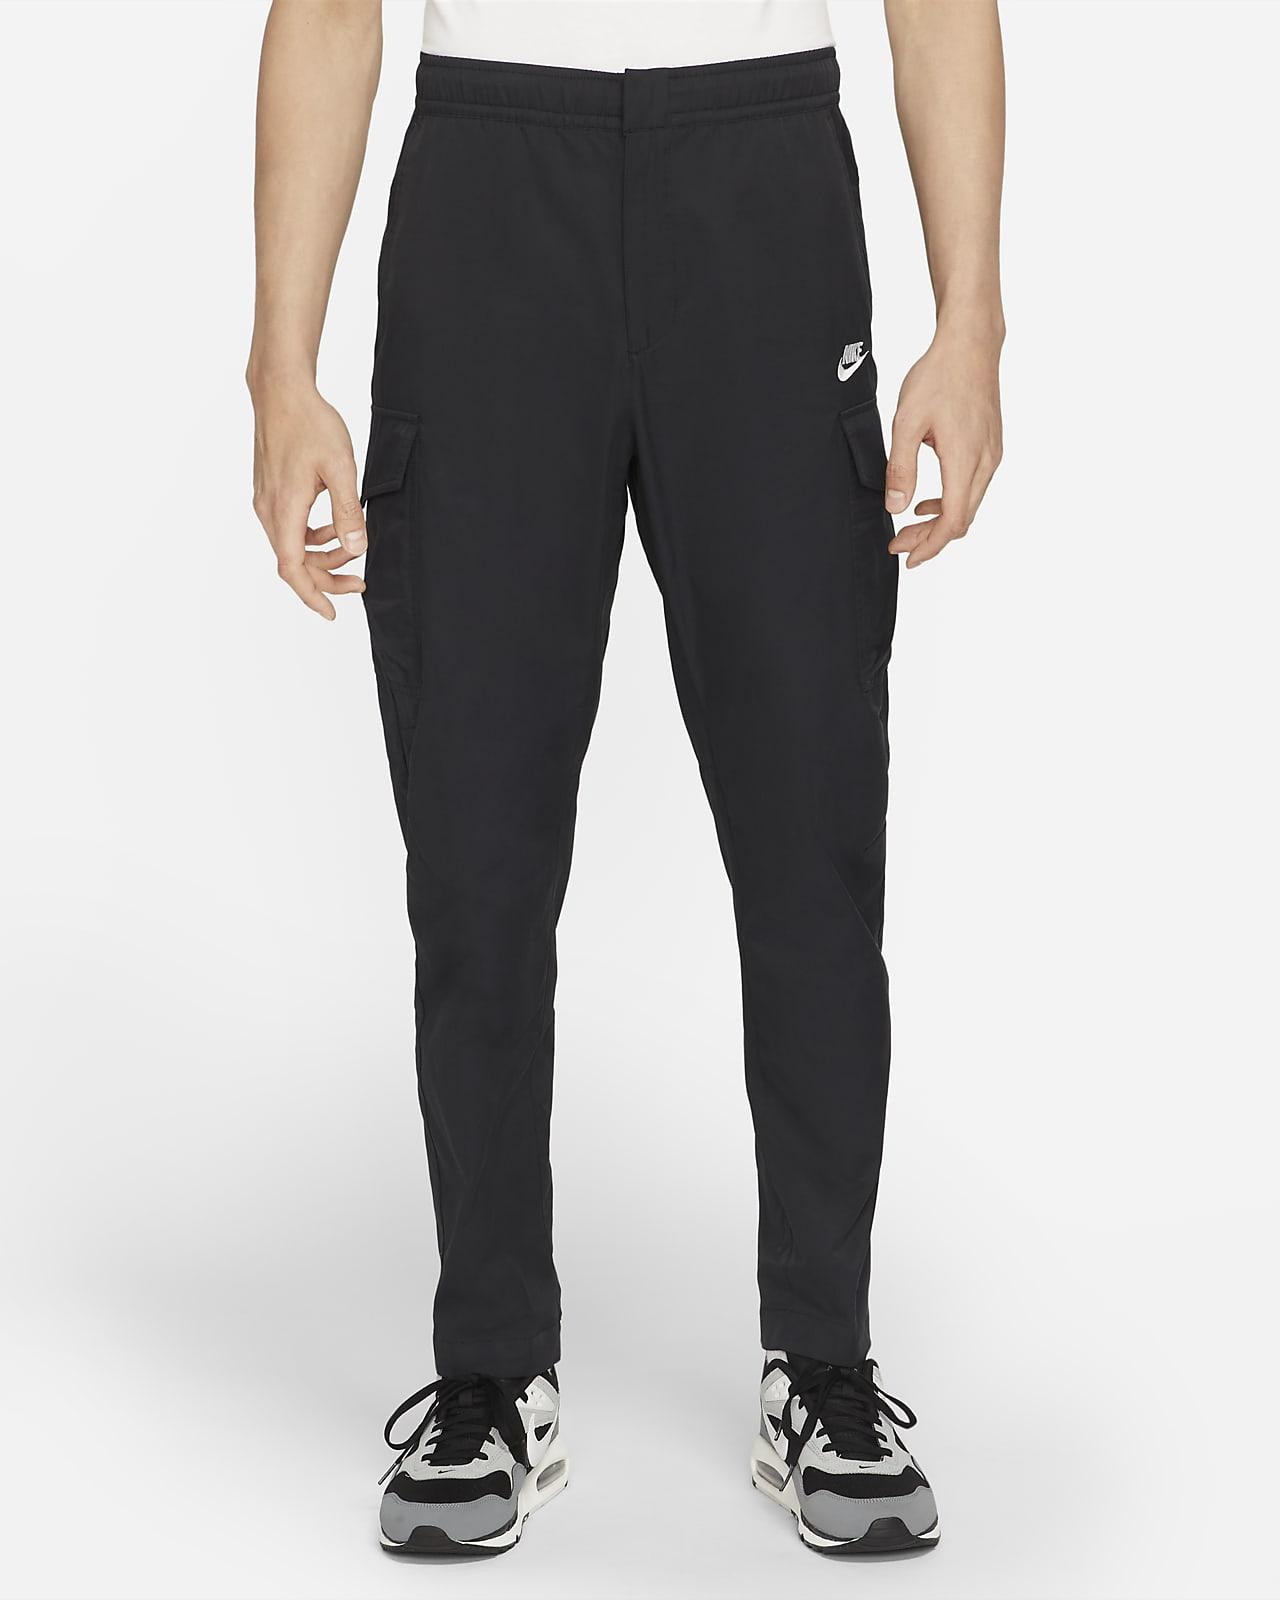 Pantalon cargo utilitaire non doublé Nike Sportswear pour Homme